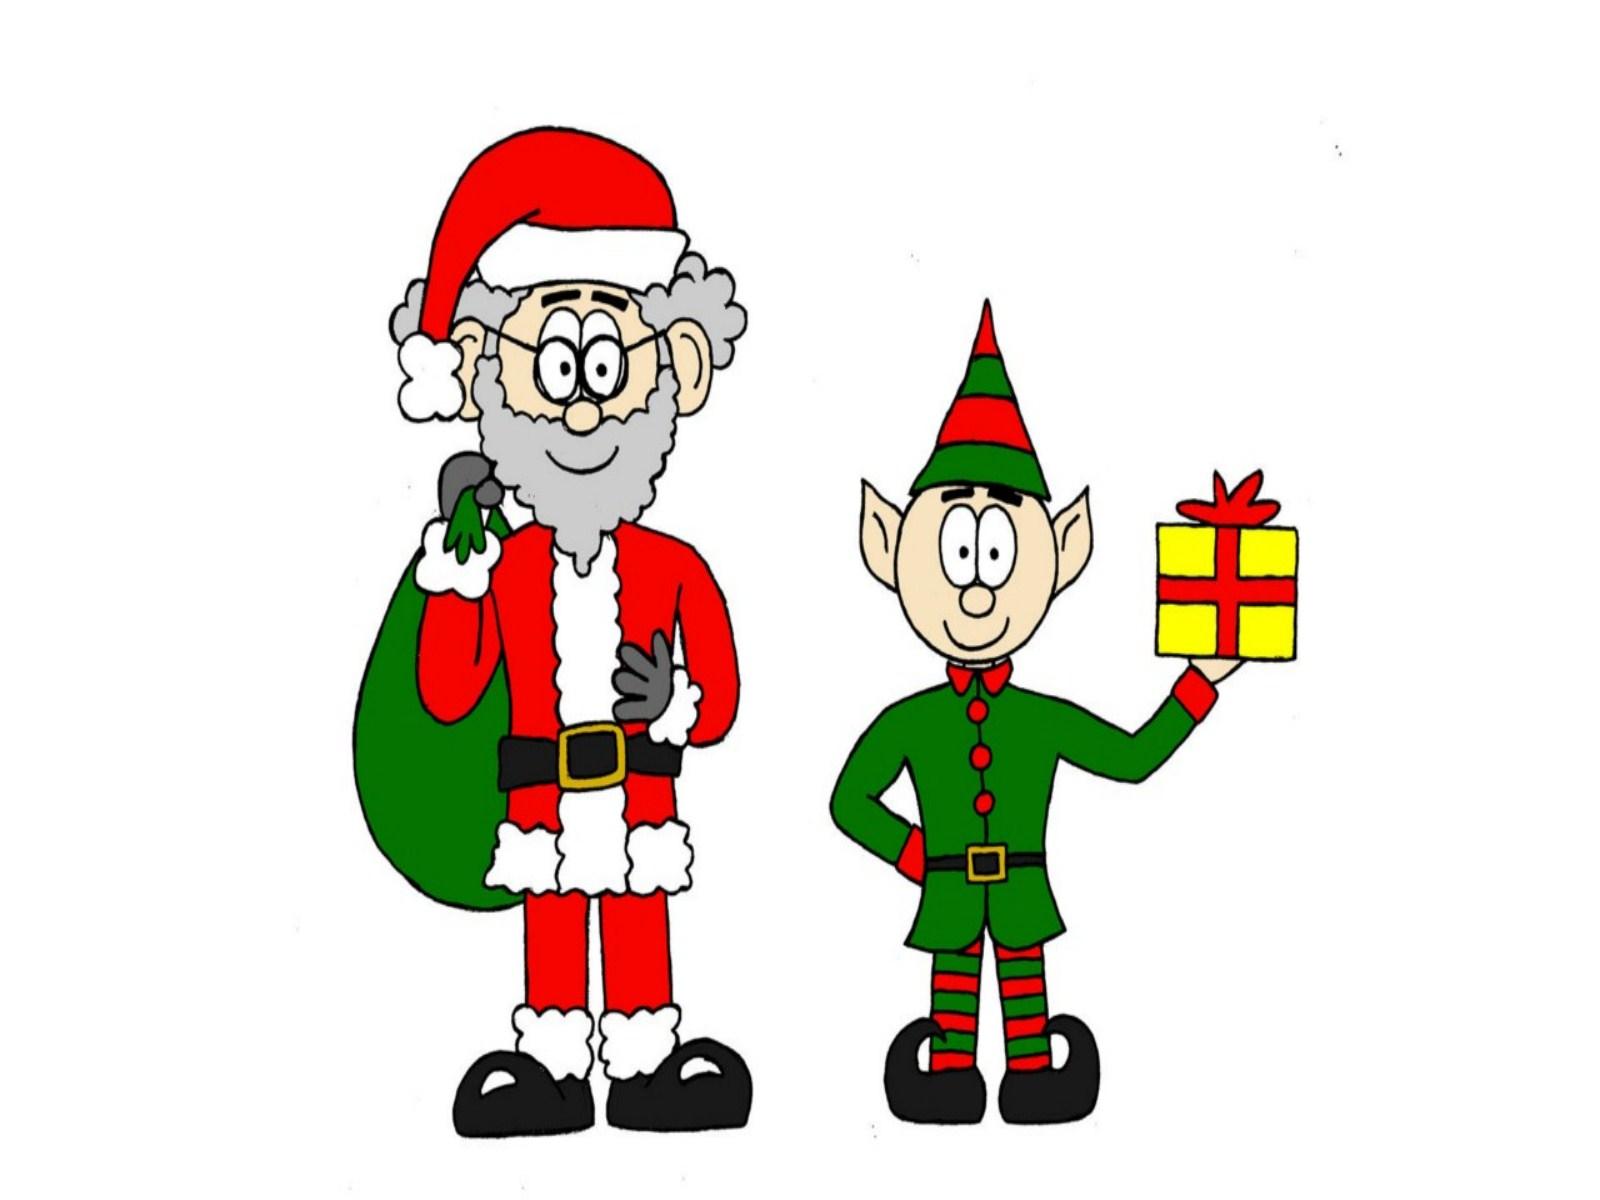 Christmas Elf wallpapers 2013 2013 Happy Xmas Elf merry Christmas 1600x1200